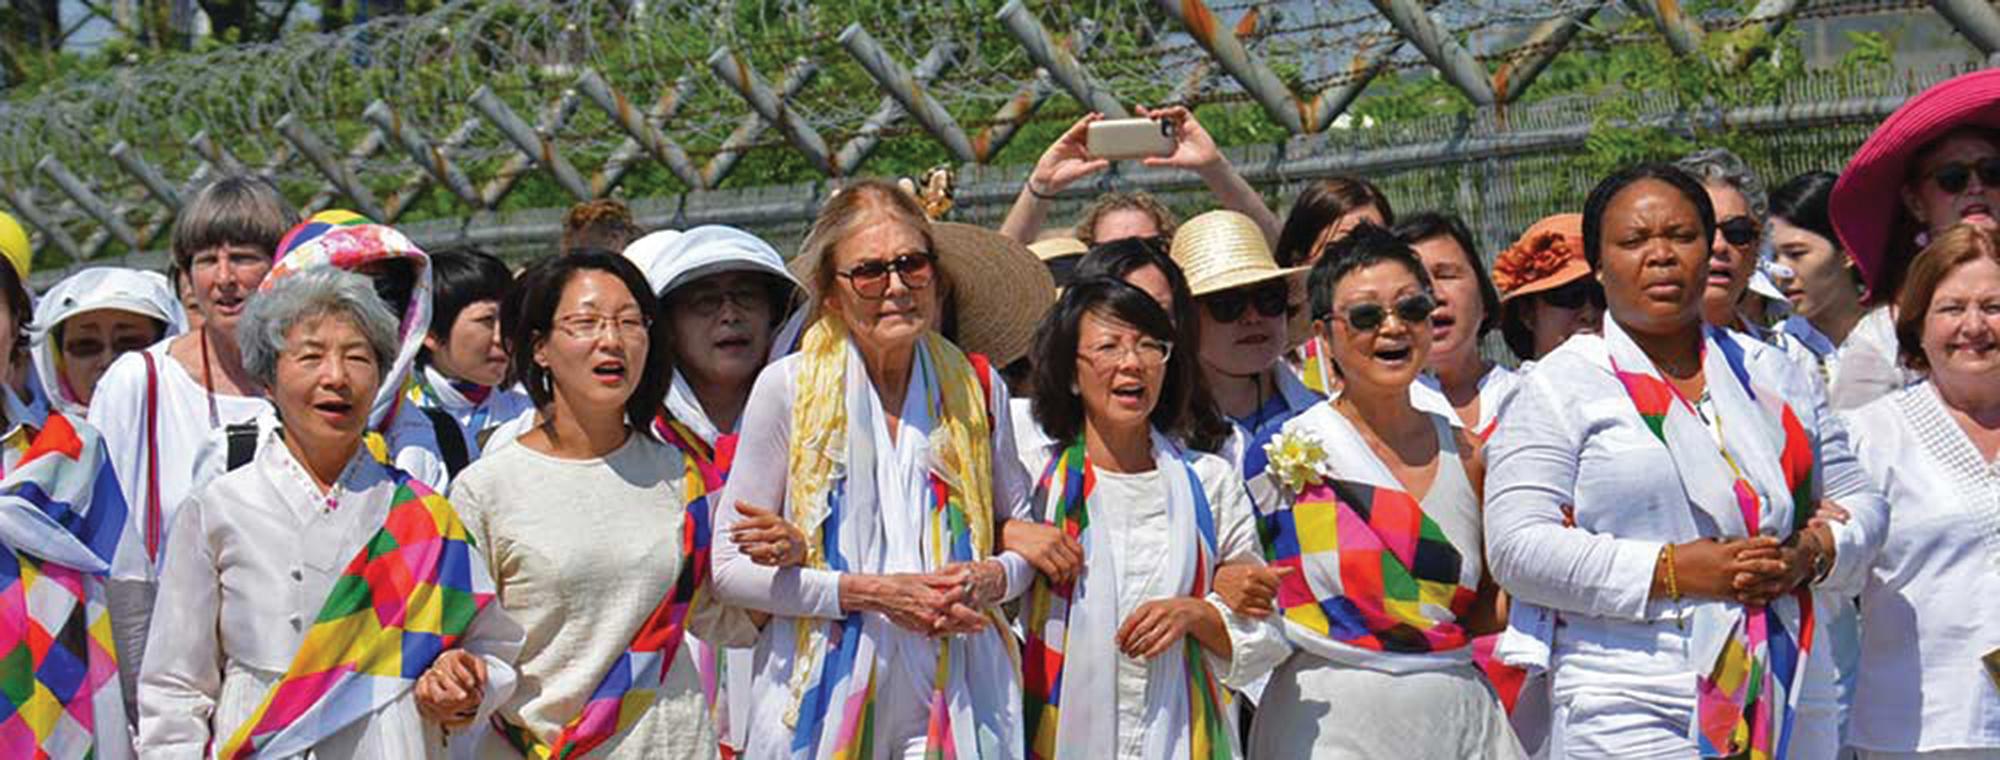 Women crossing the DMZ in 2015, South Korea. Image: Women Cross DMZ